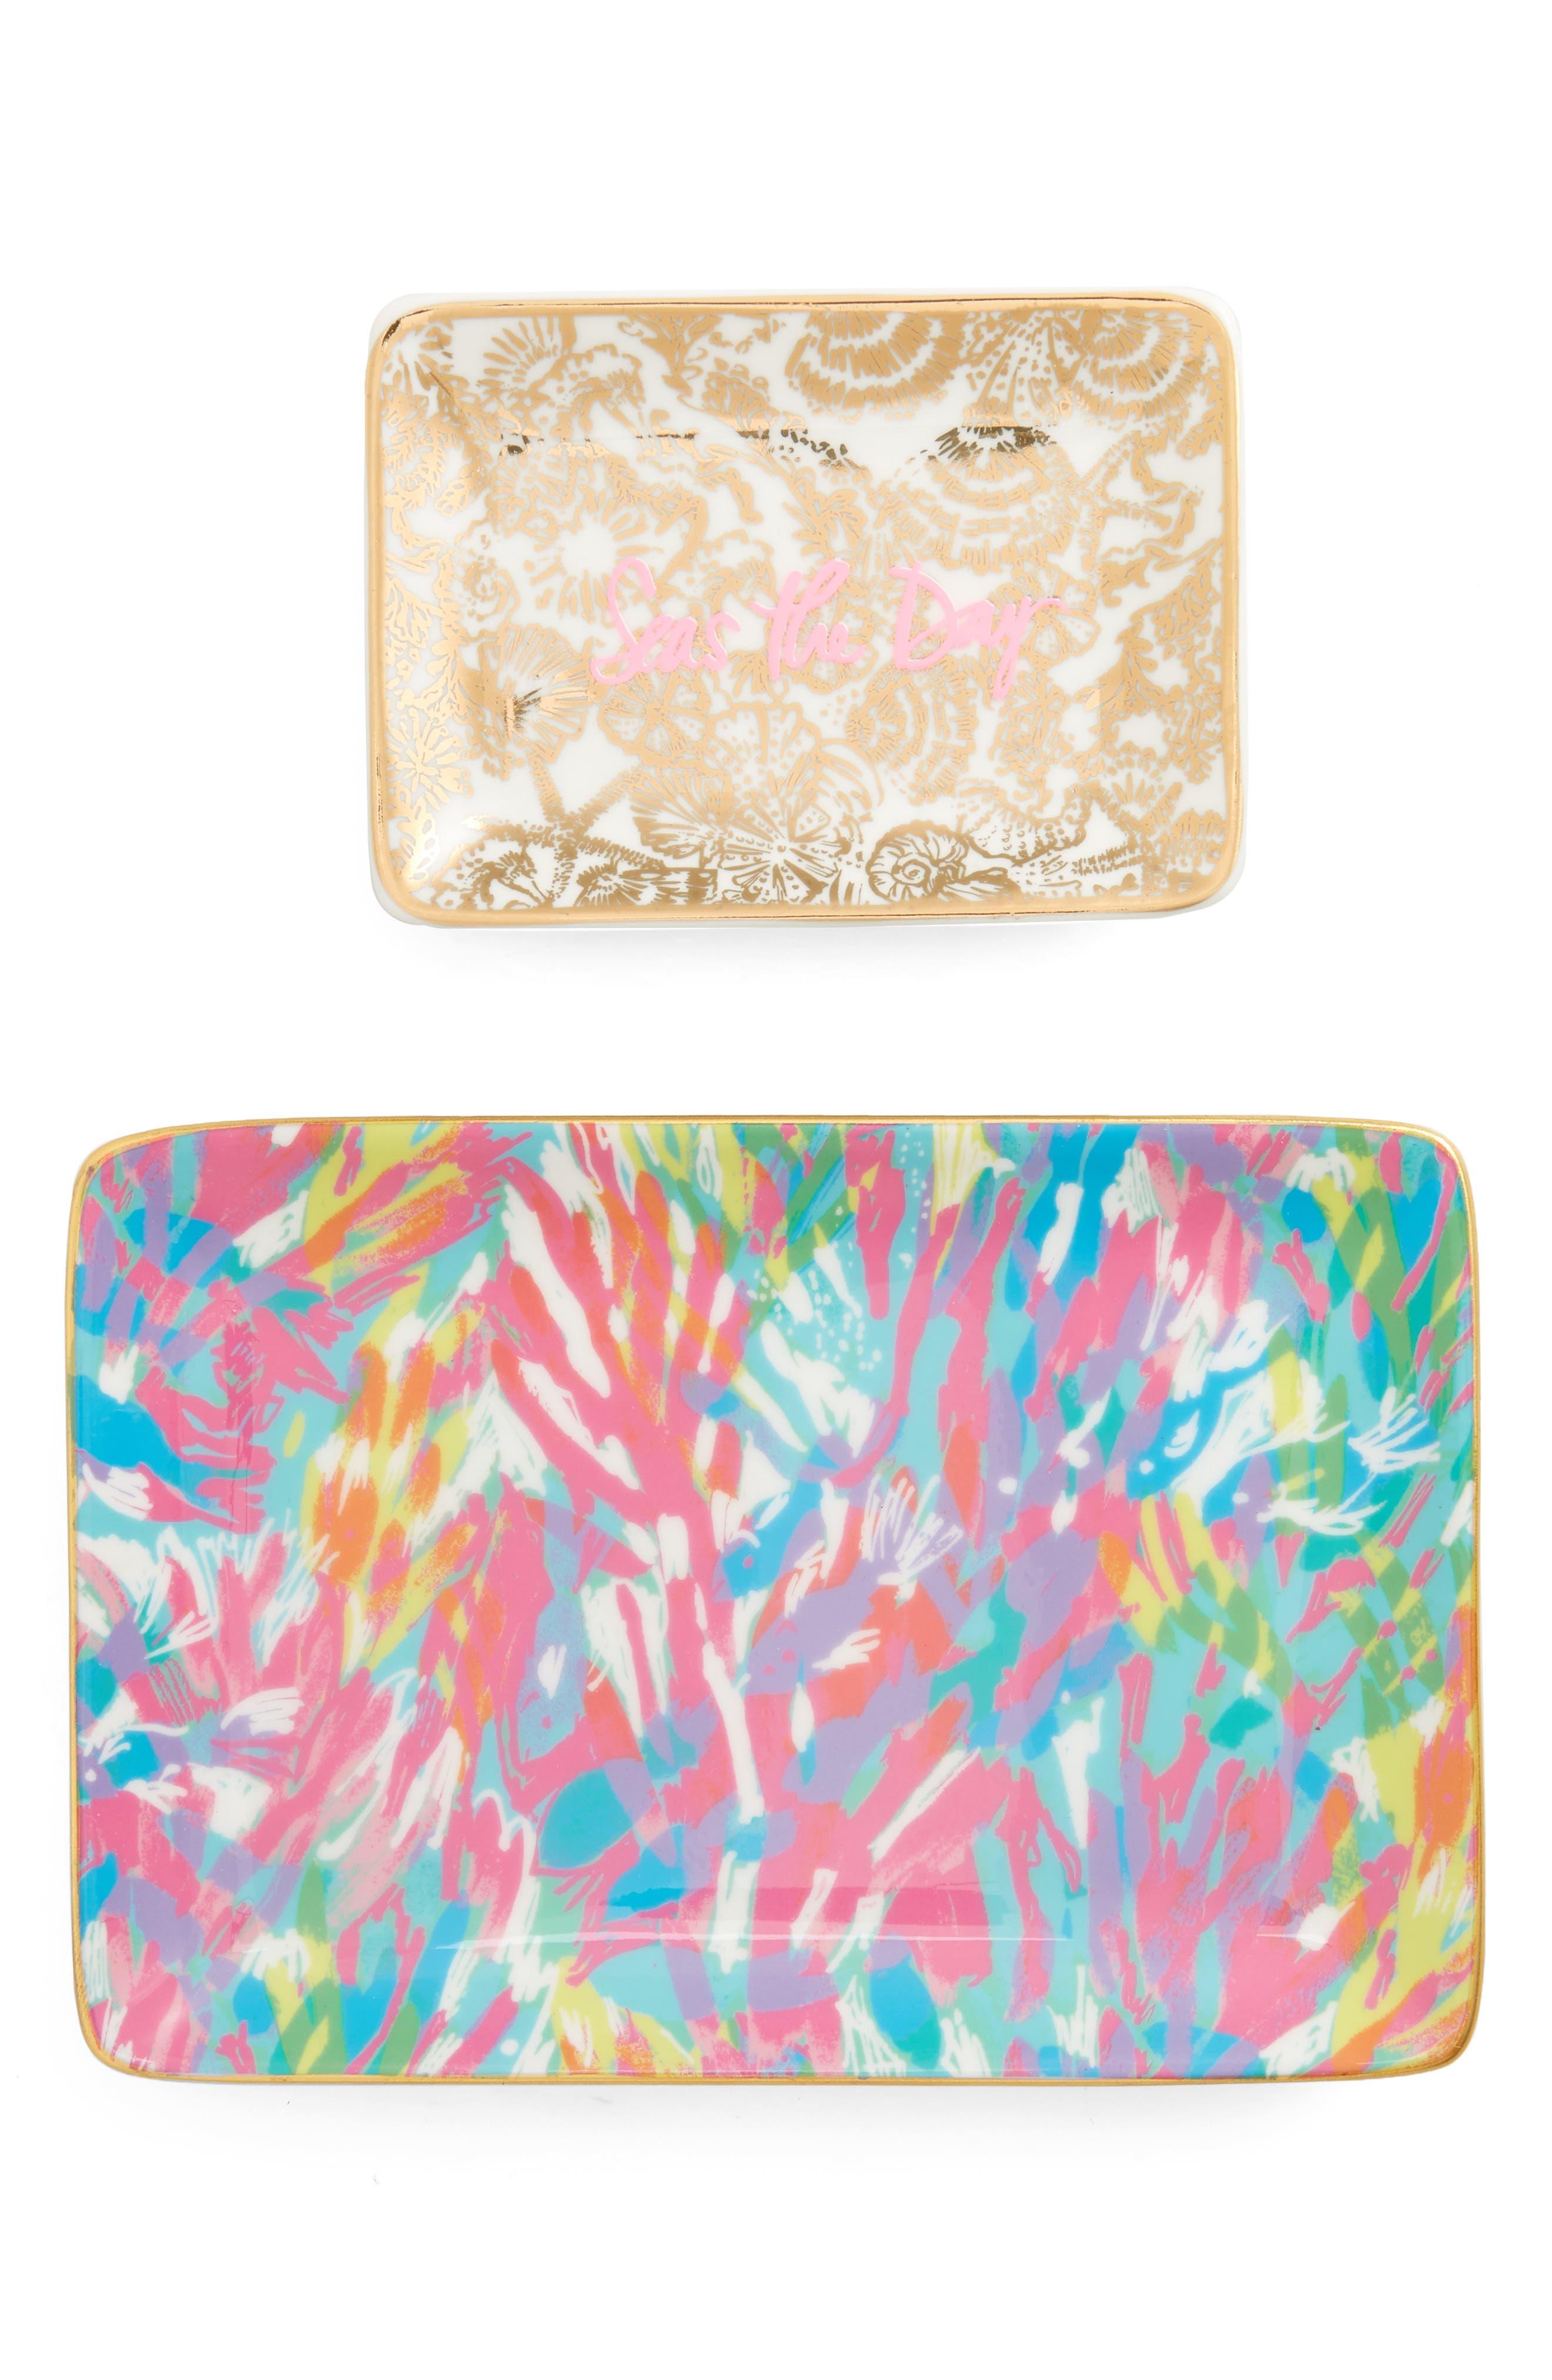 Set of 2 Ceramic Trinket Trays,                             Main thumbnail 1, color,                             650